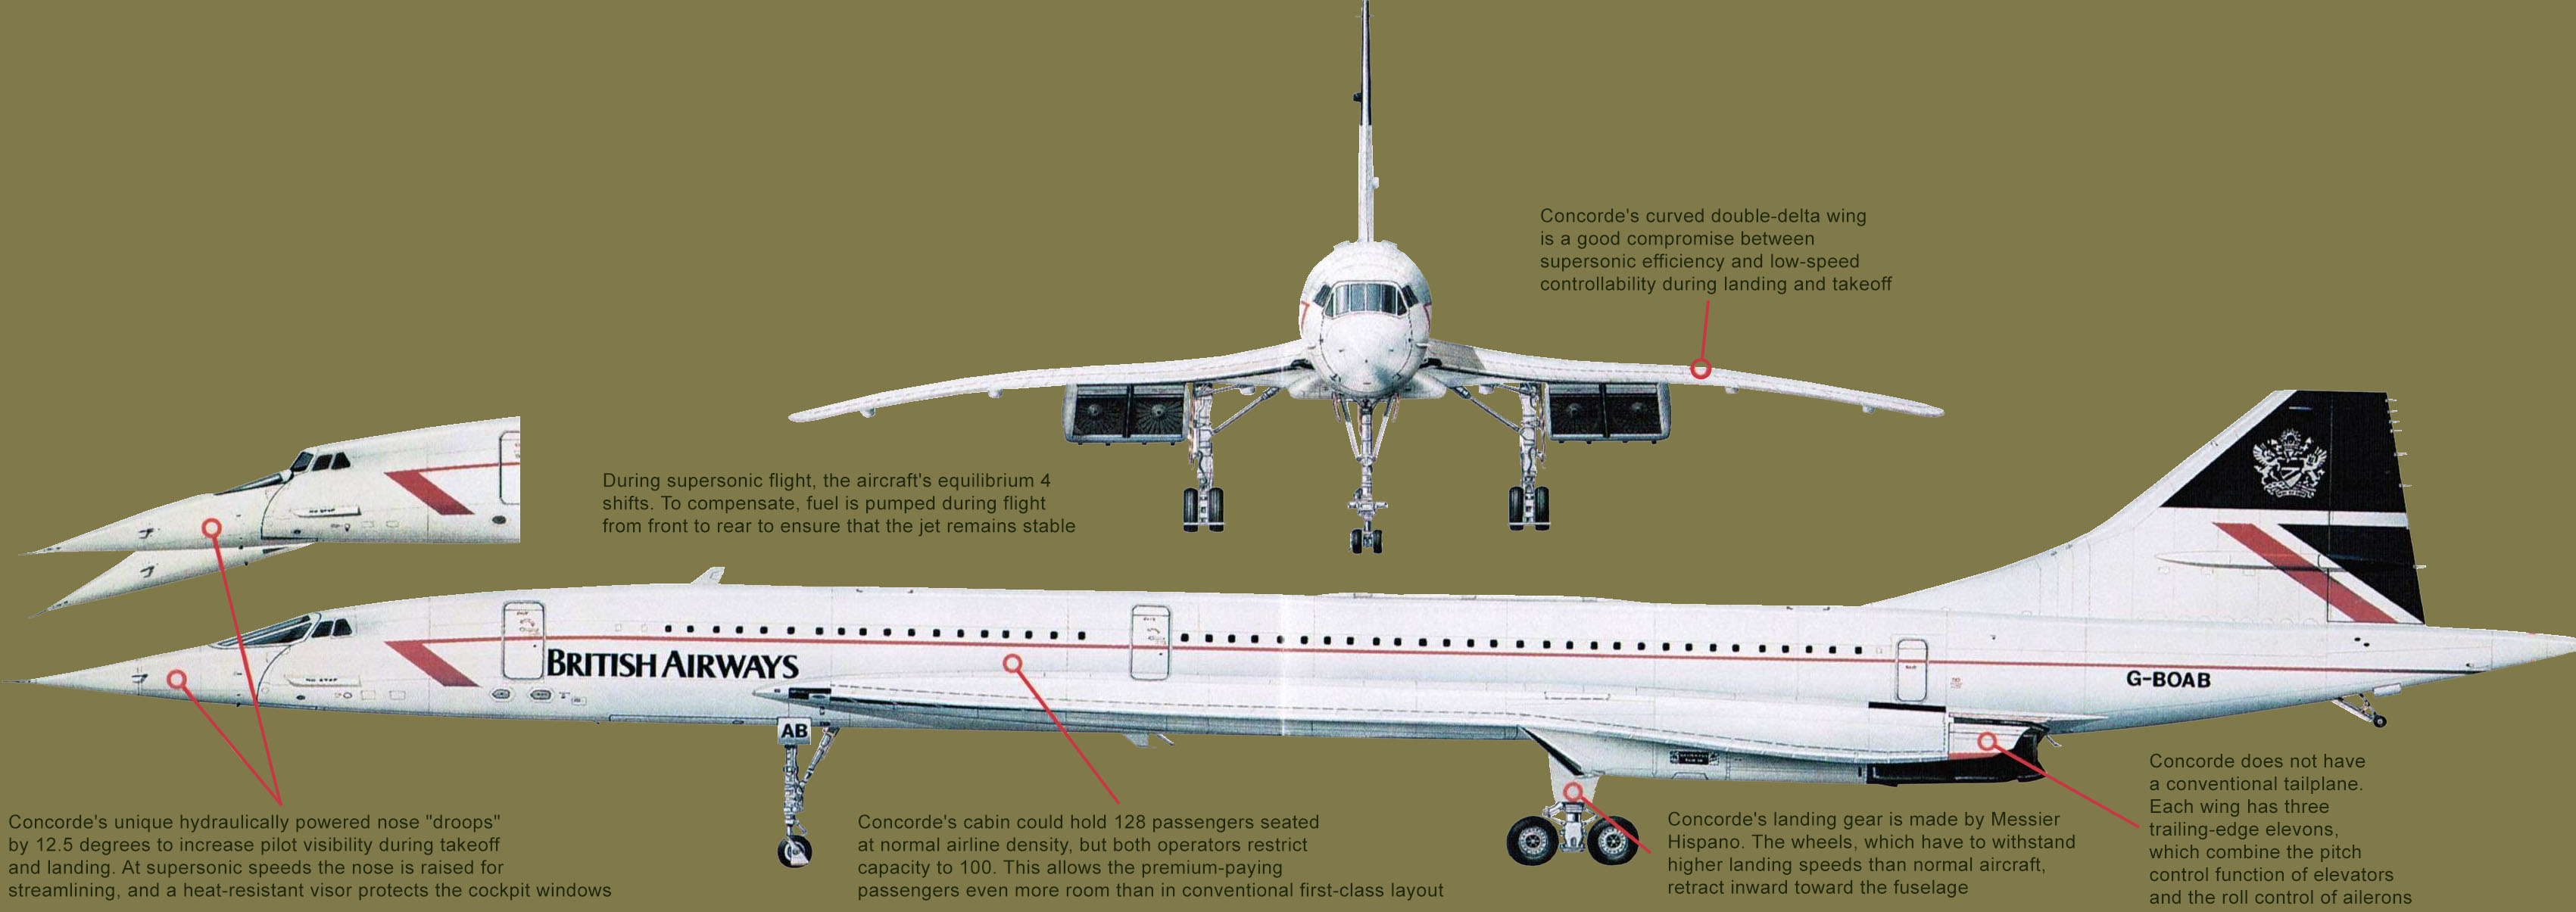 Ł SPECIFICATIONS Concorde